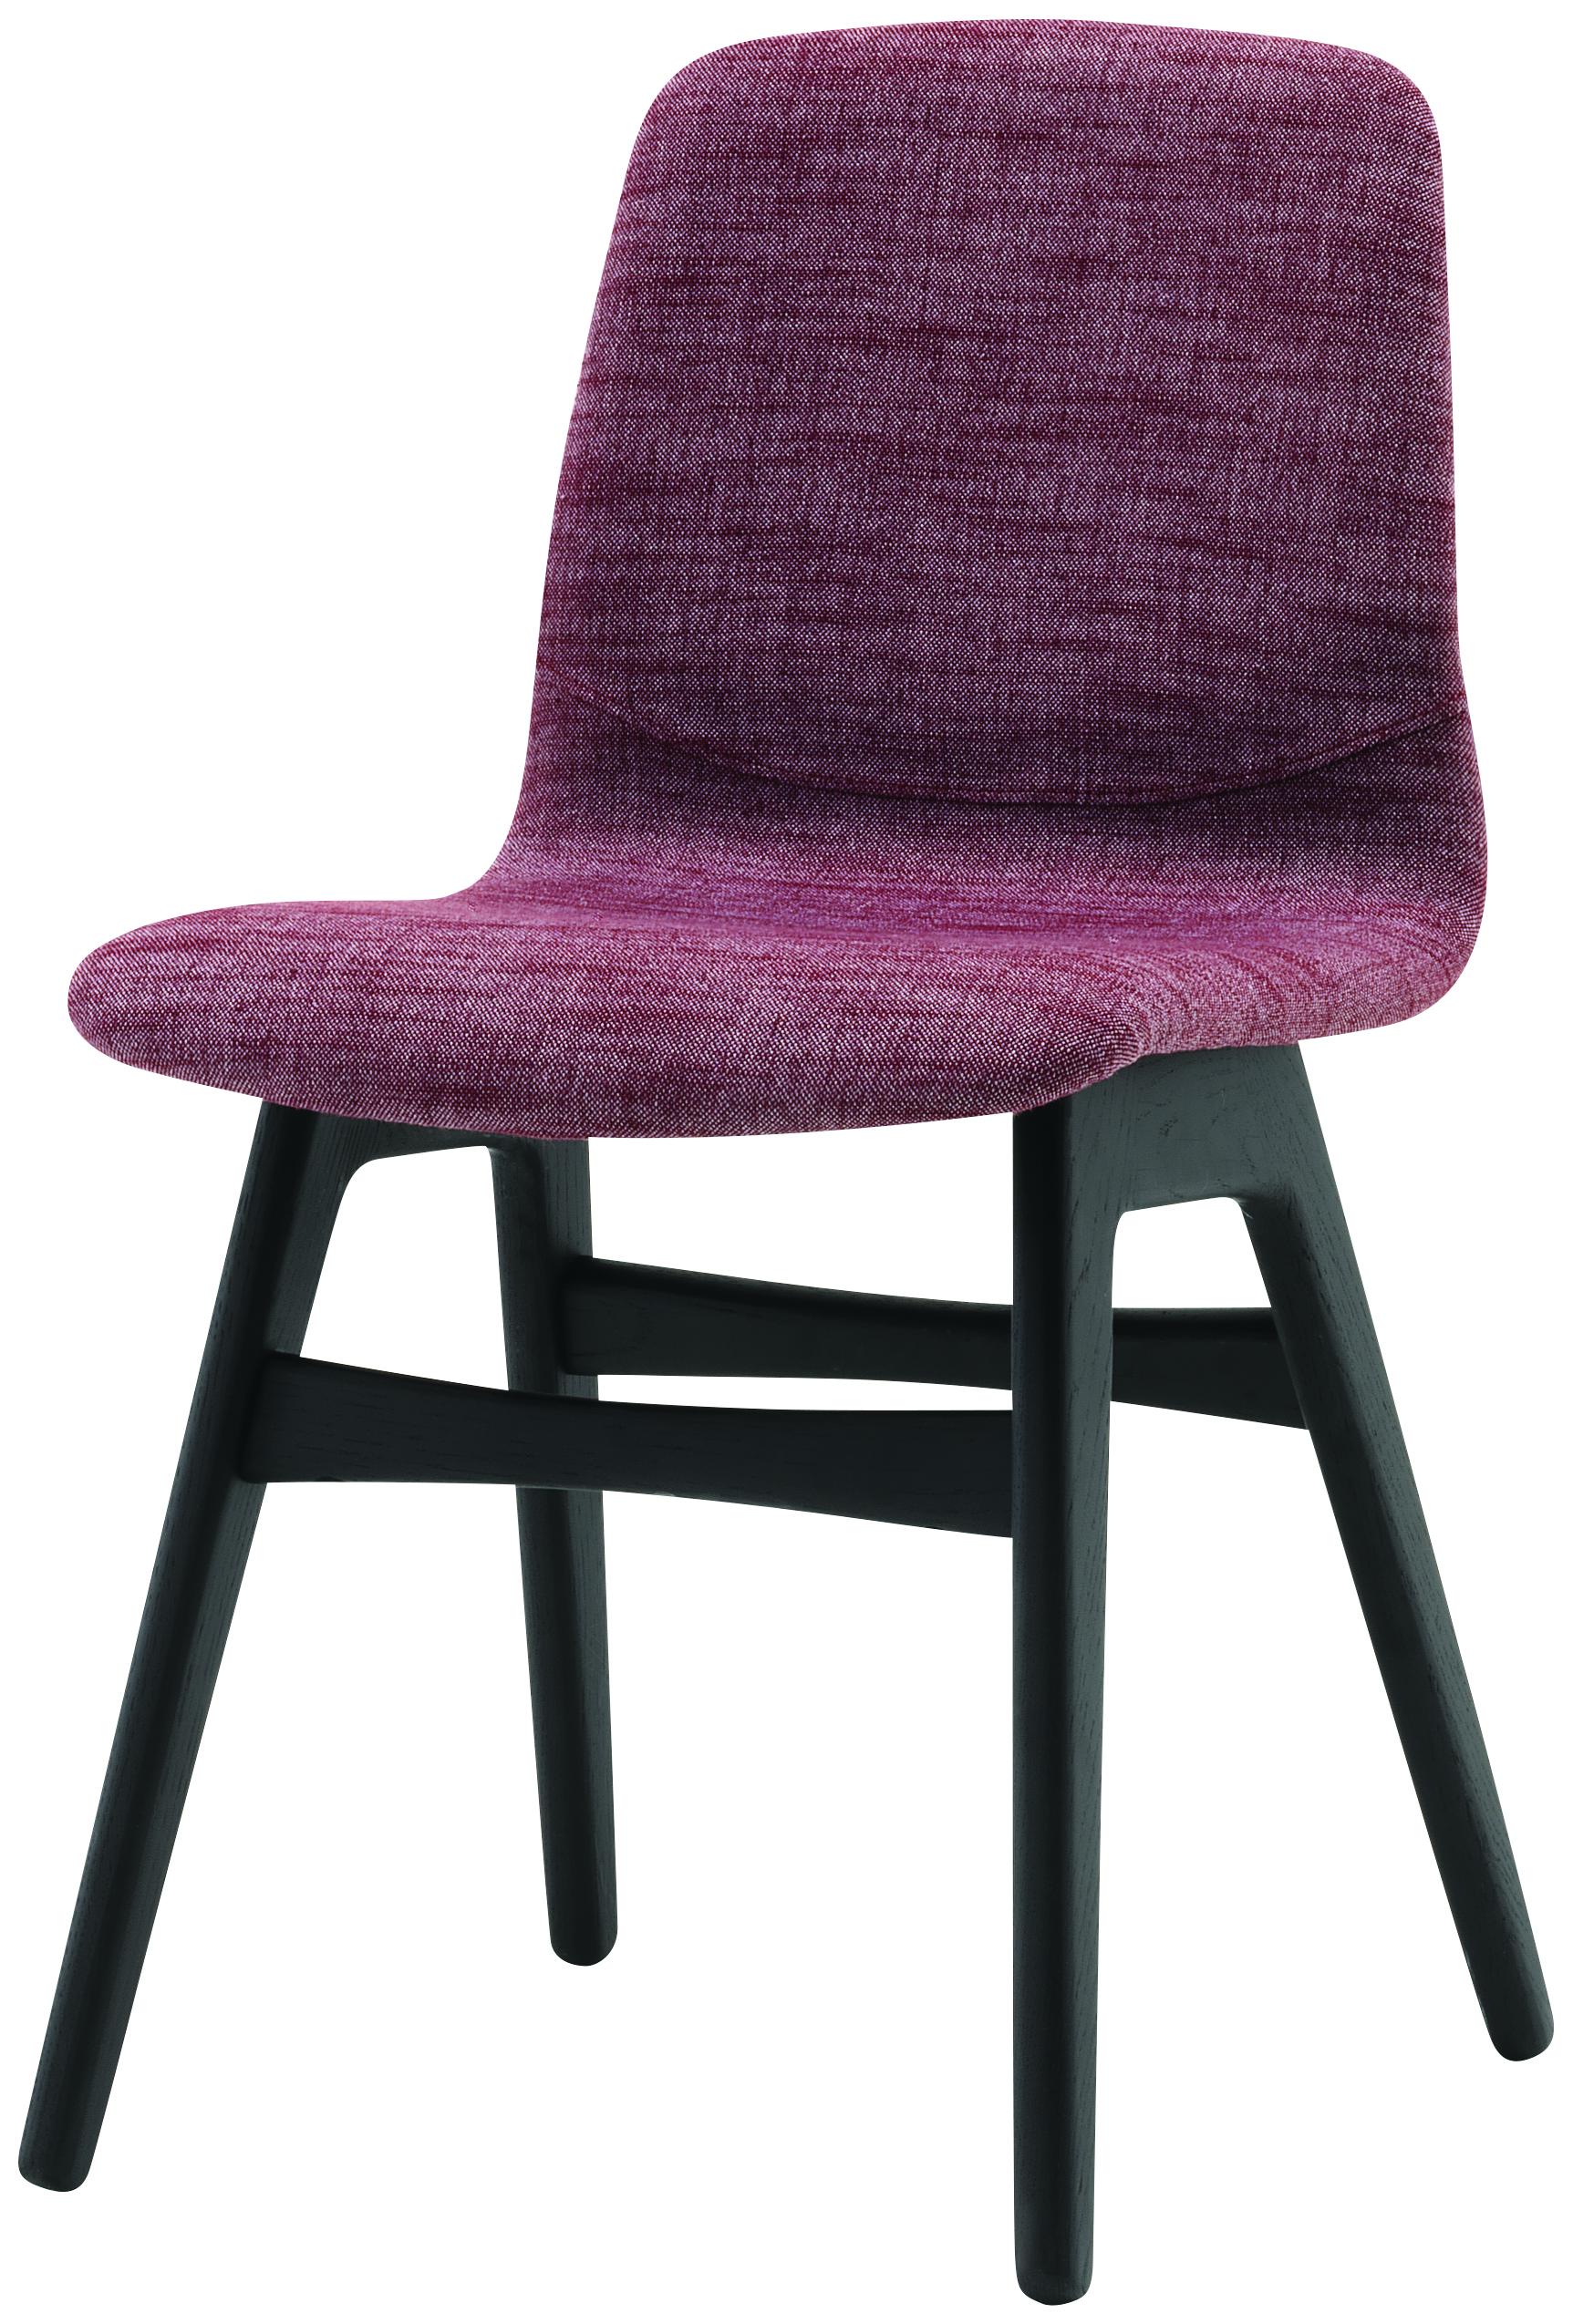 chair boconcept cambridge. Black Bedroom Furniture Sets. Home Design Ideas